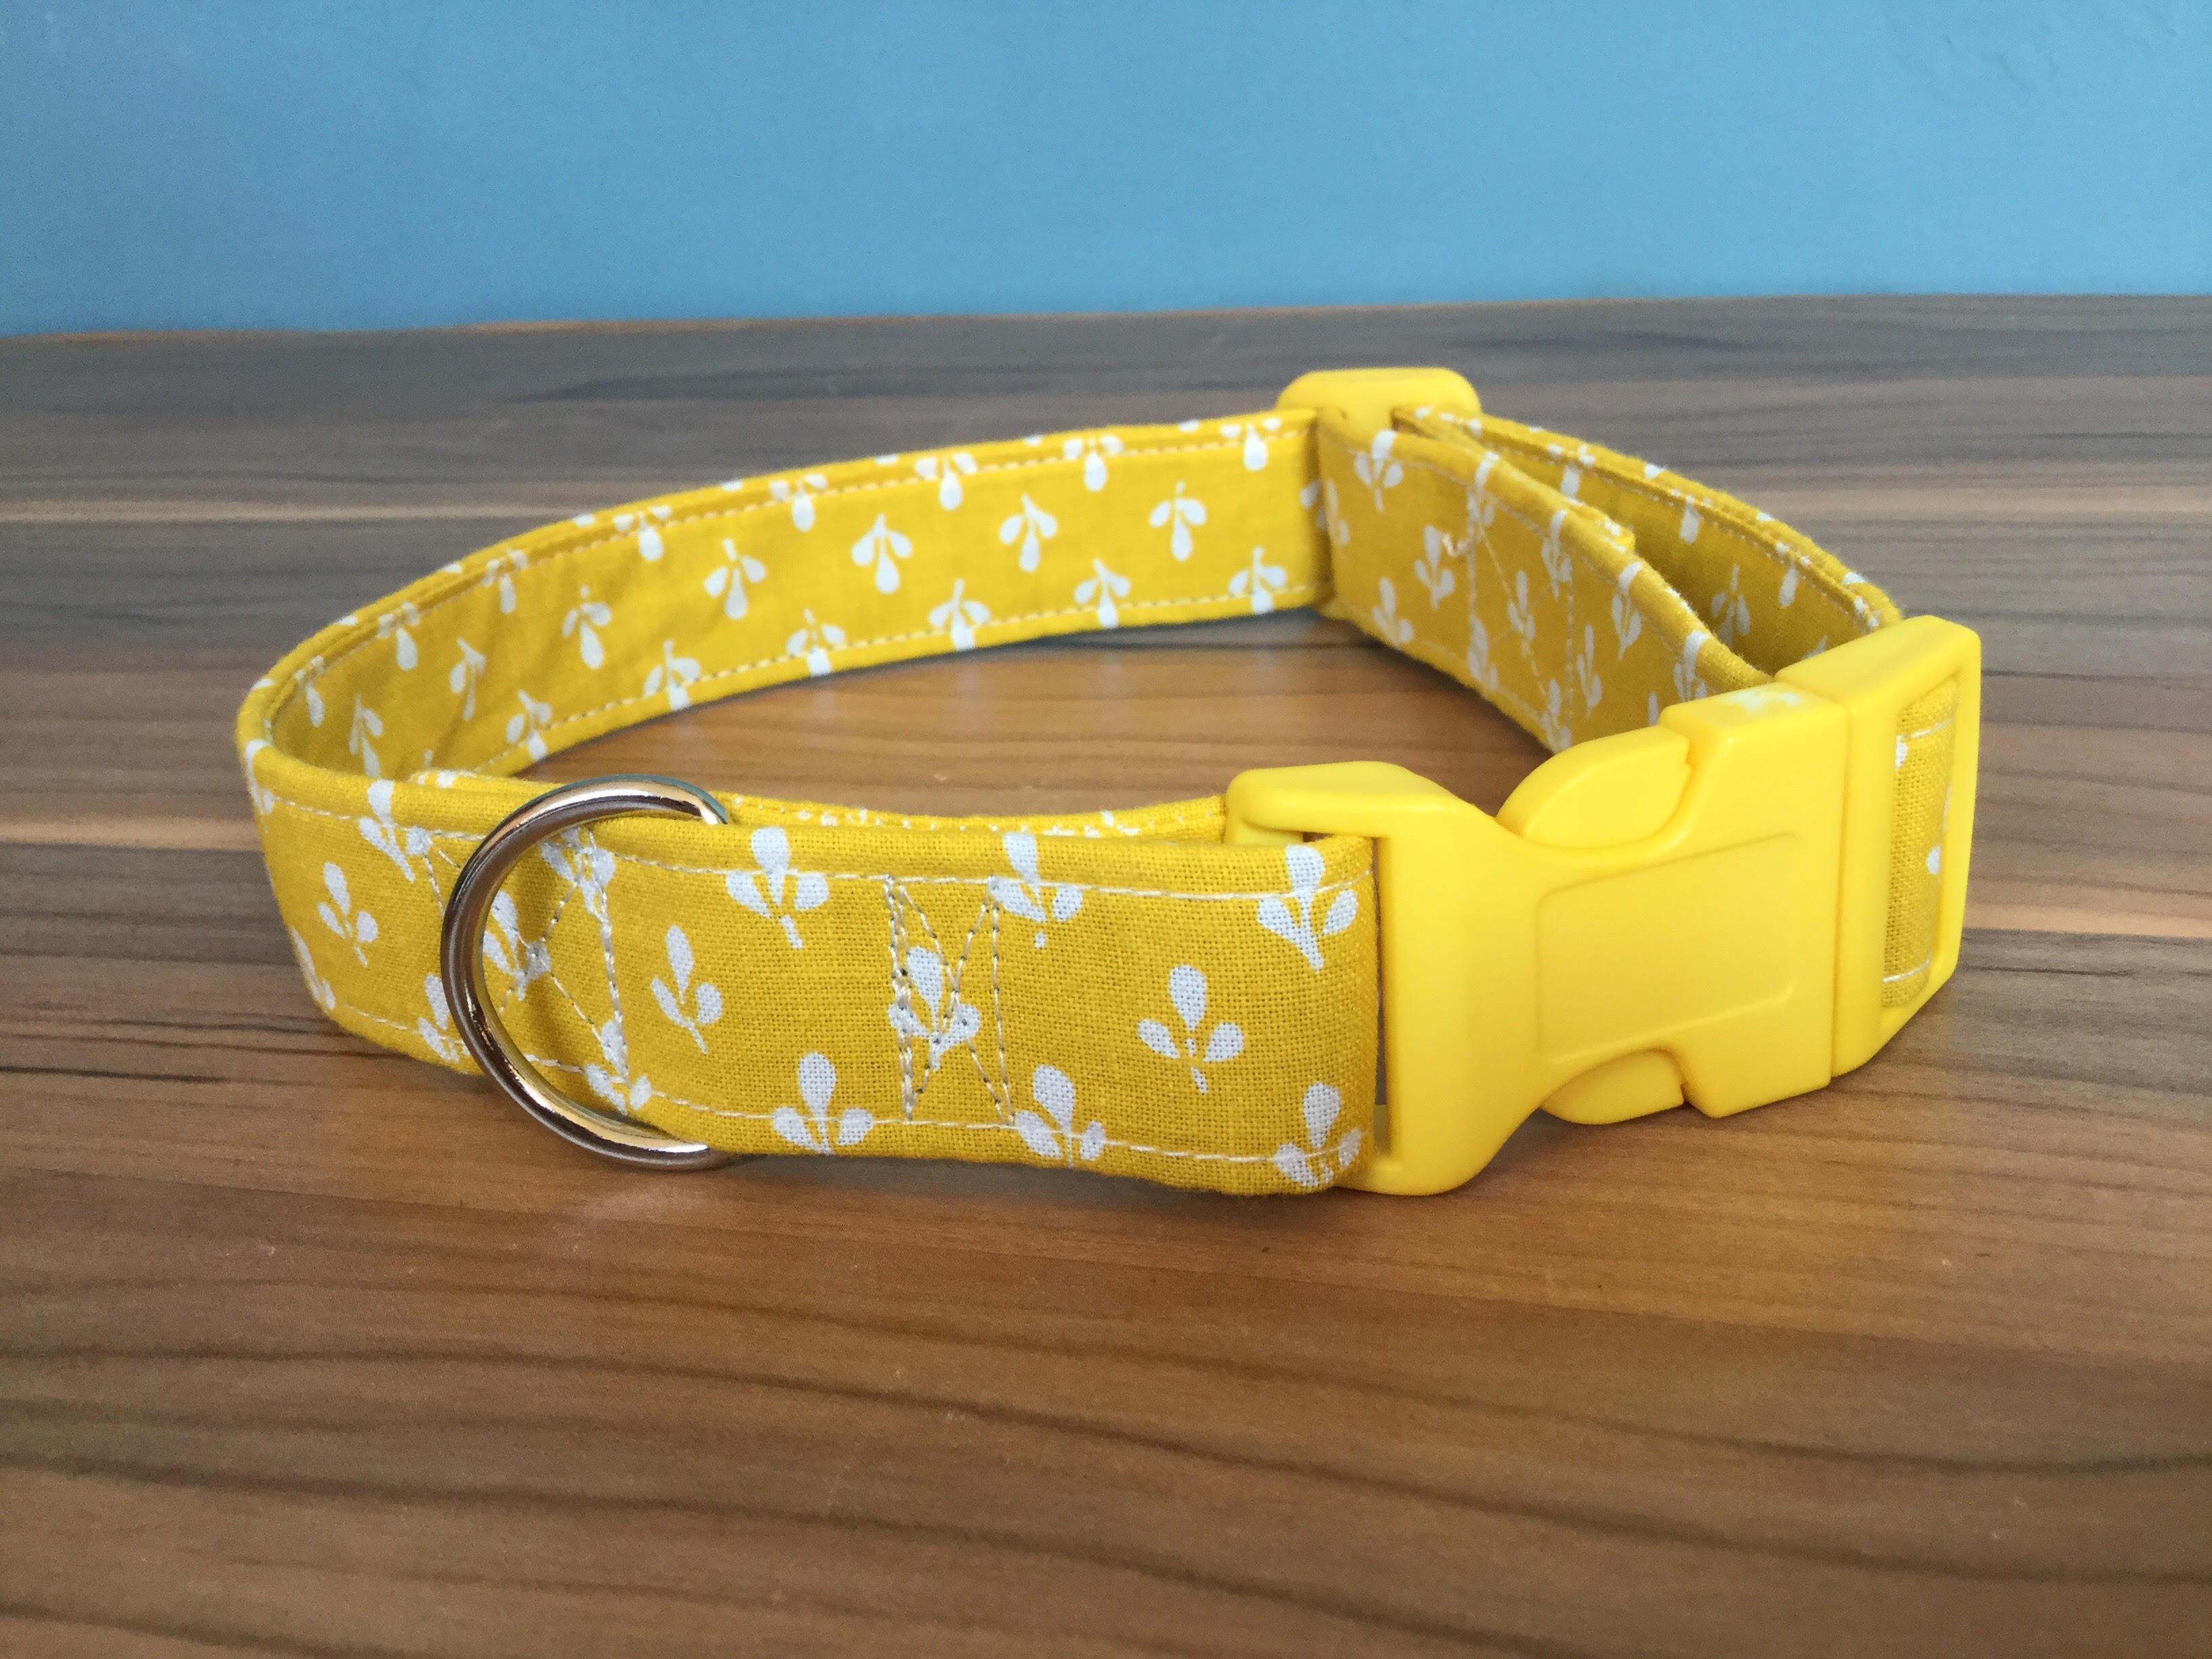 Claude fabric dog collar